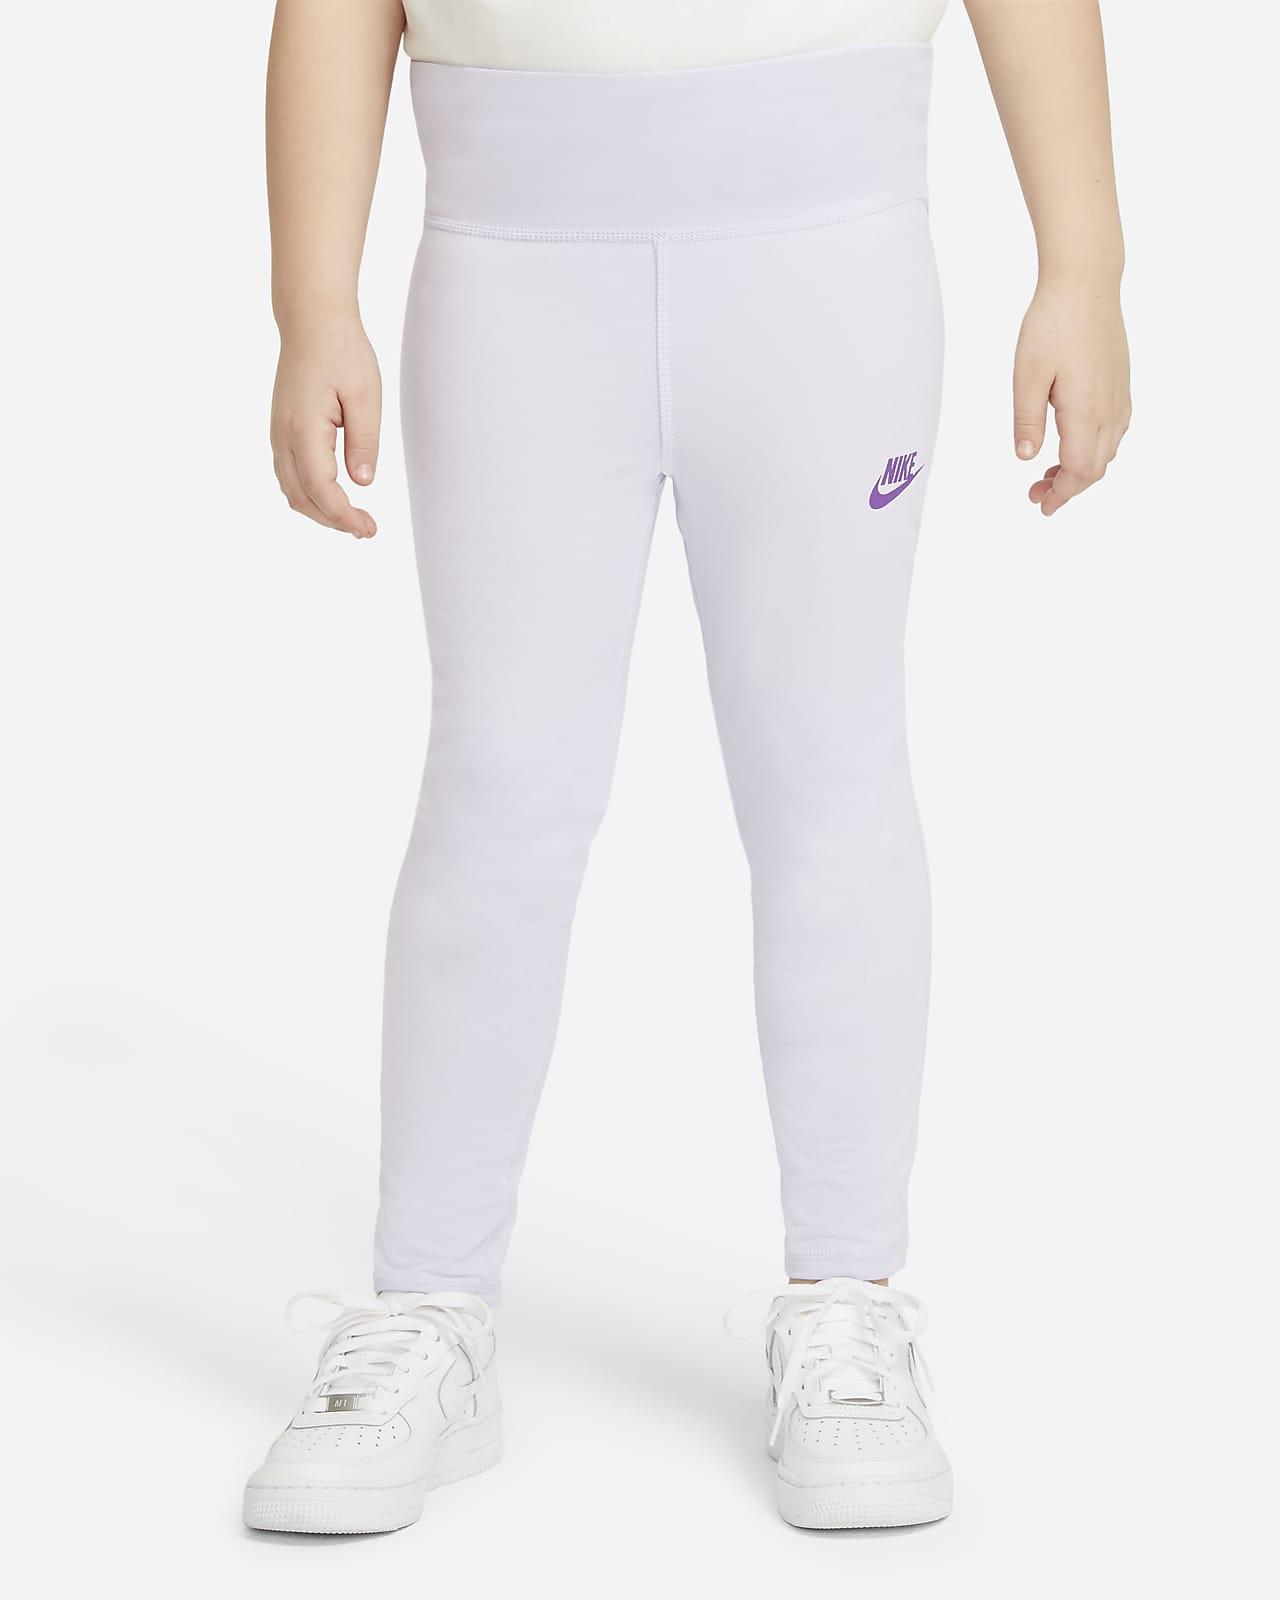 Leggings de cintura alta para niñas talla grande Nike Sportswear Favorites (talla extendida)